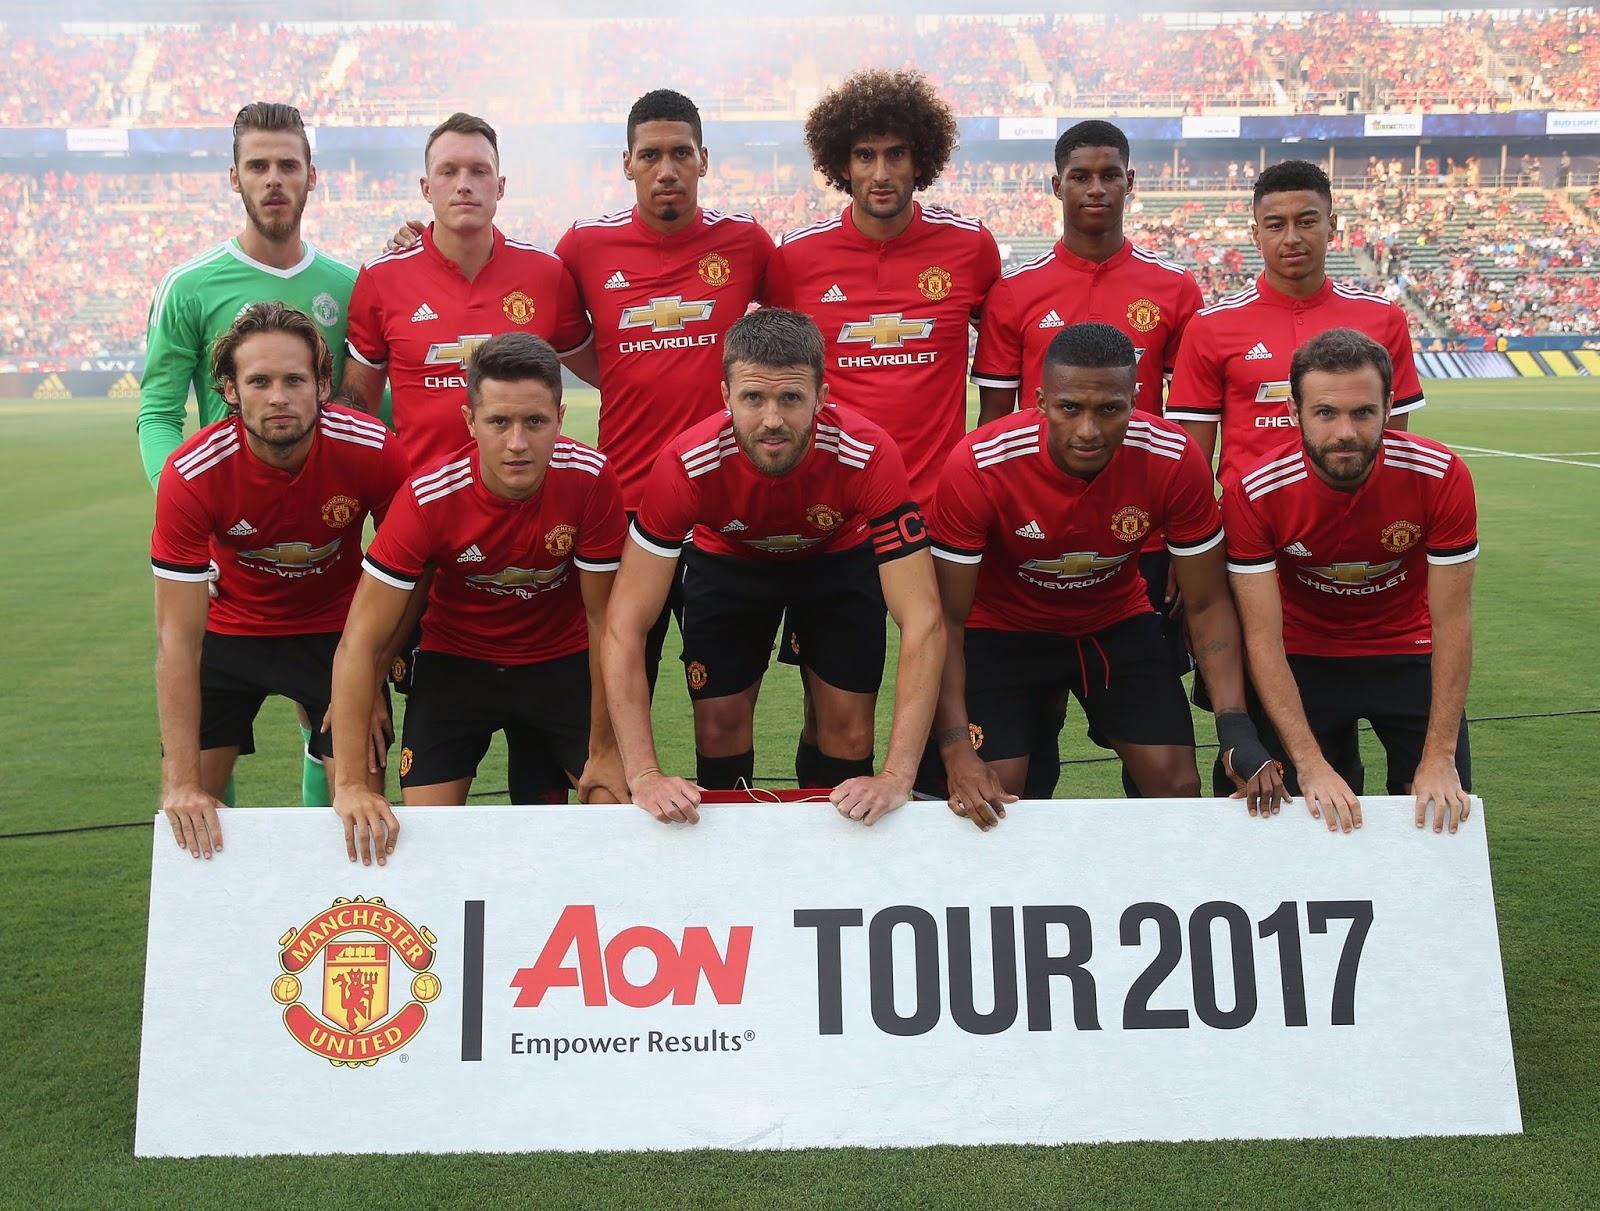 Review Hasil Pertandingan La Galaxy Vs Manchester United